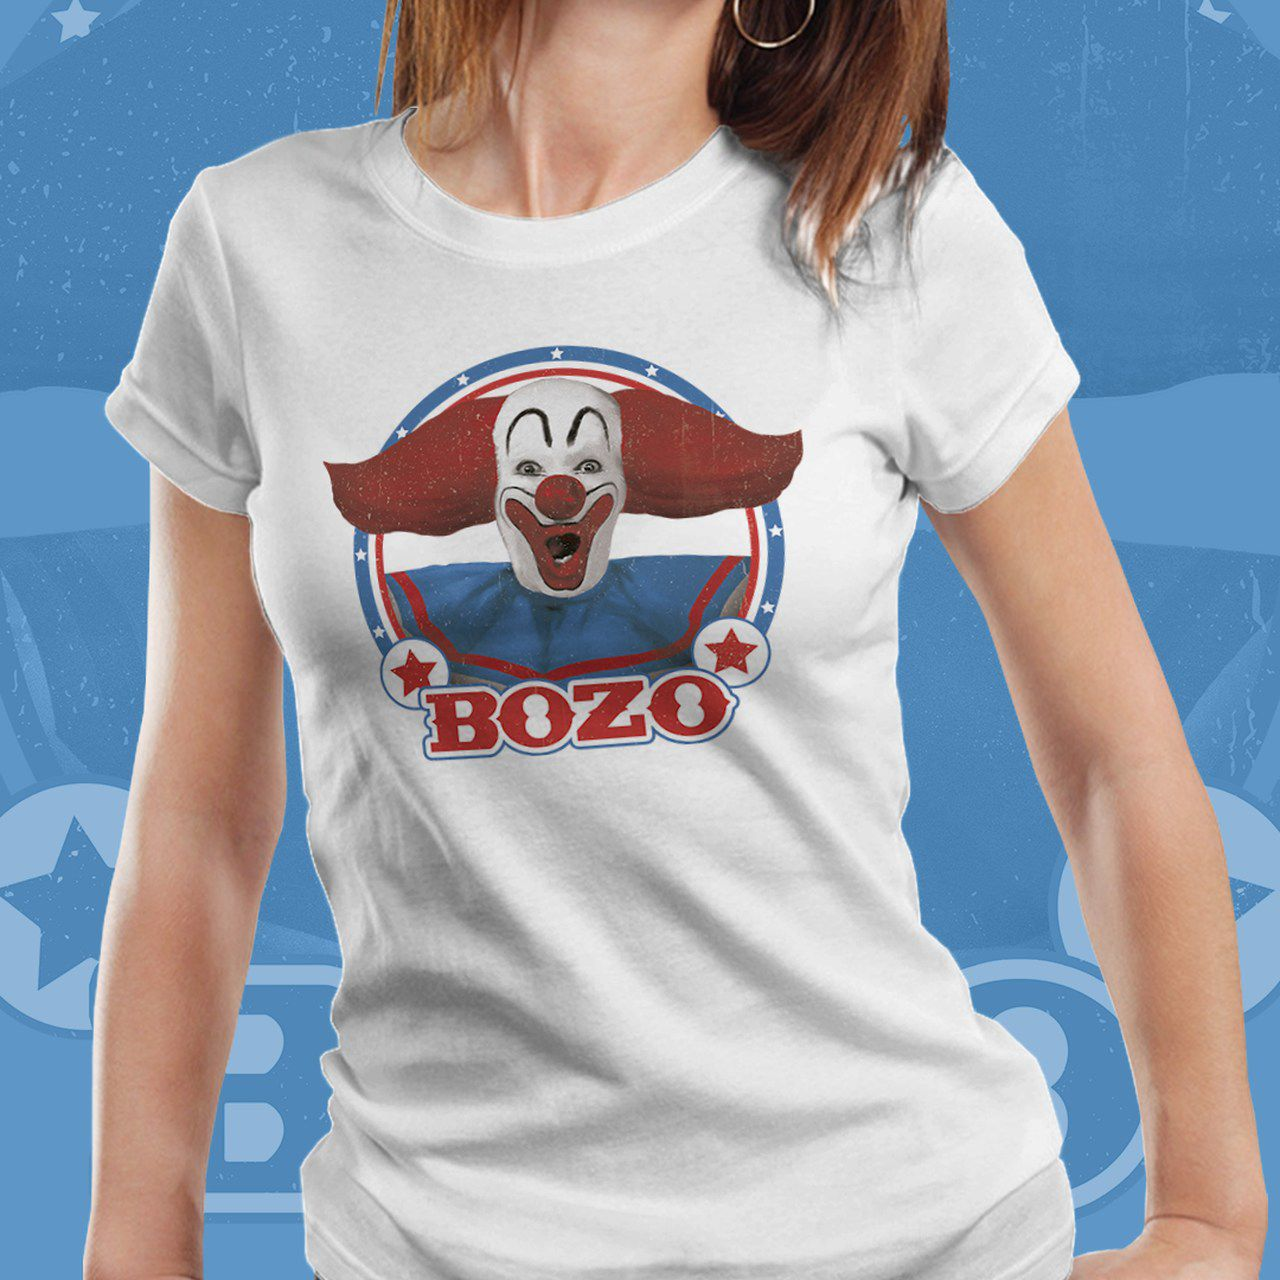 Camiseta Feminina Bozo: Bozo